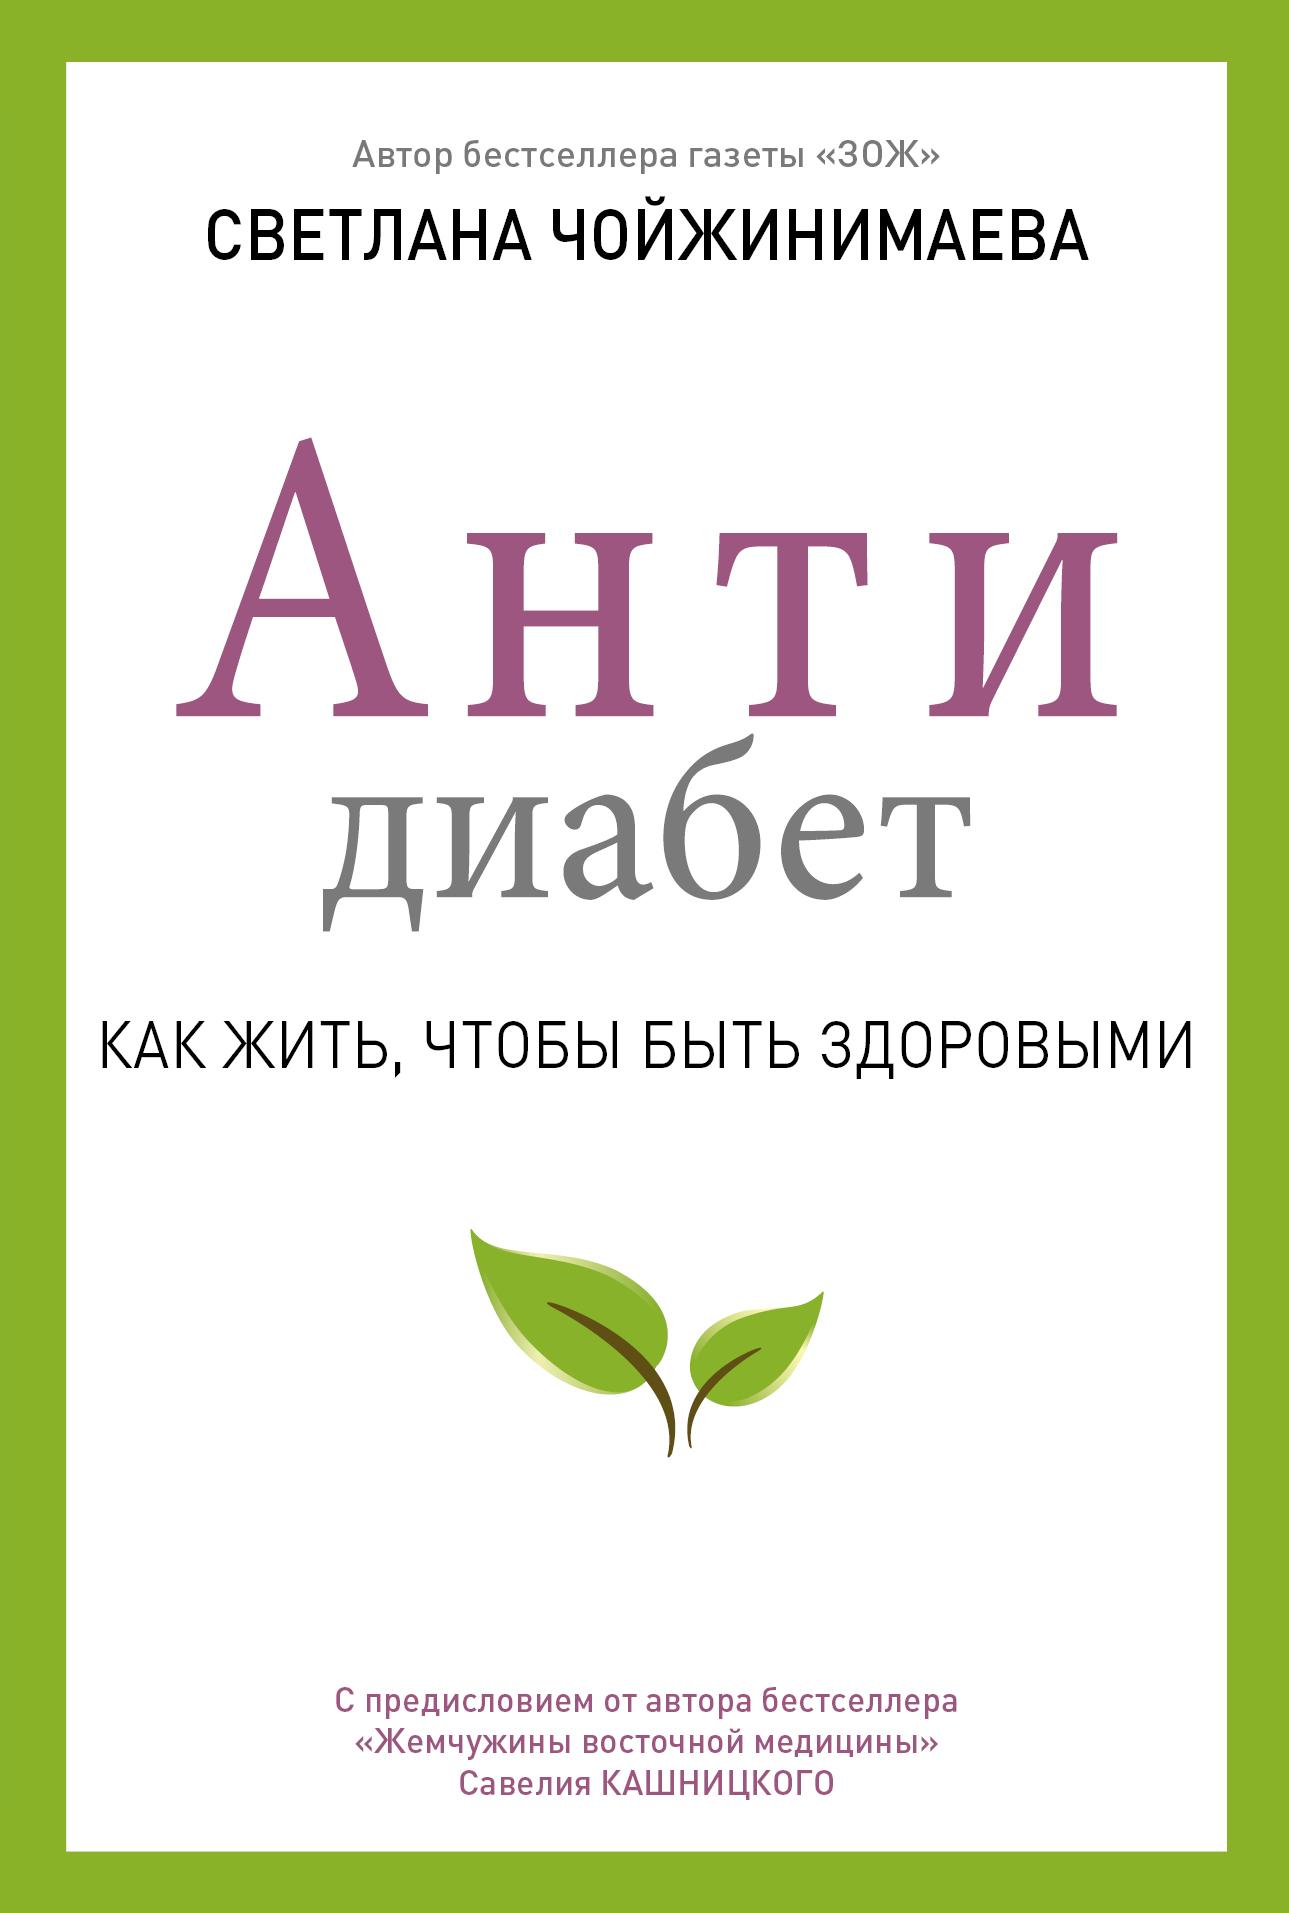 Антидиабет. Ваш новый образ жизни от book24.ru